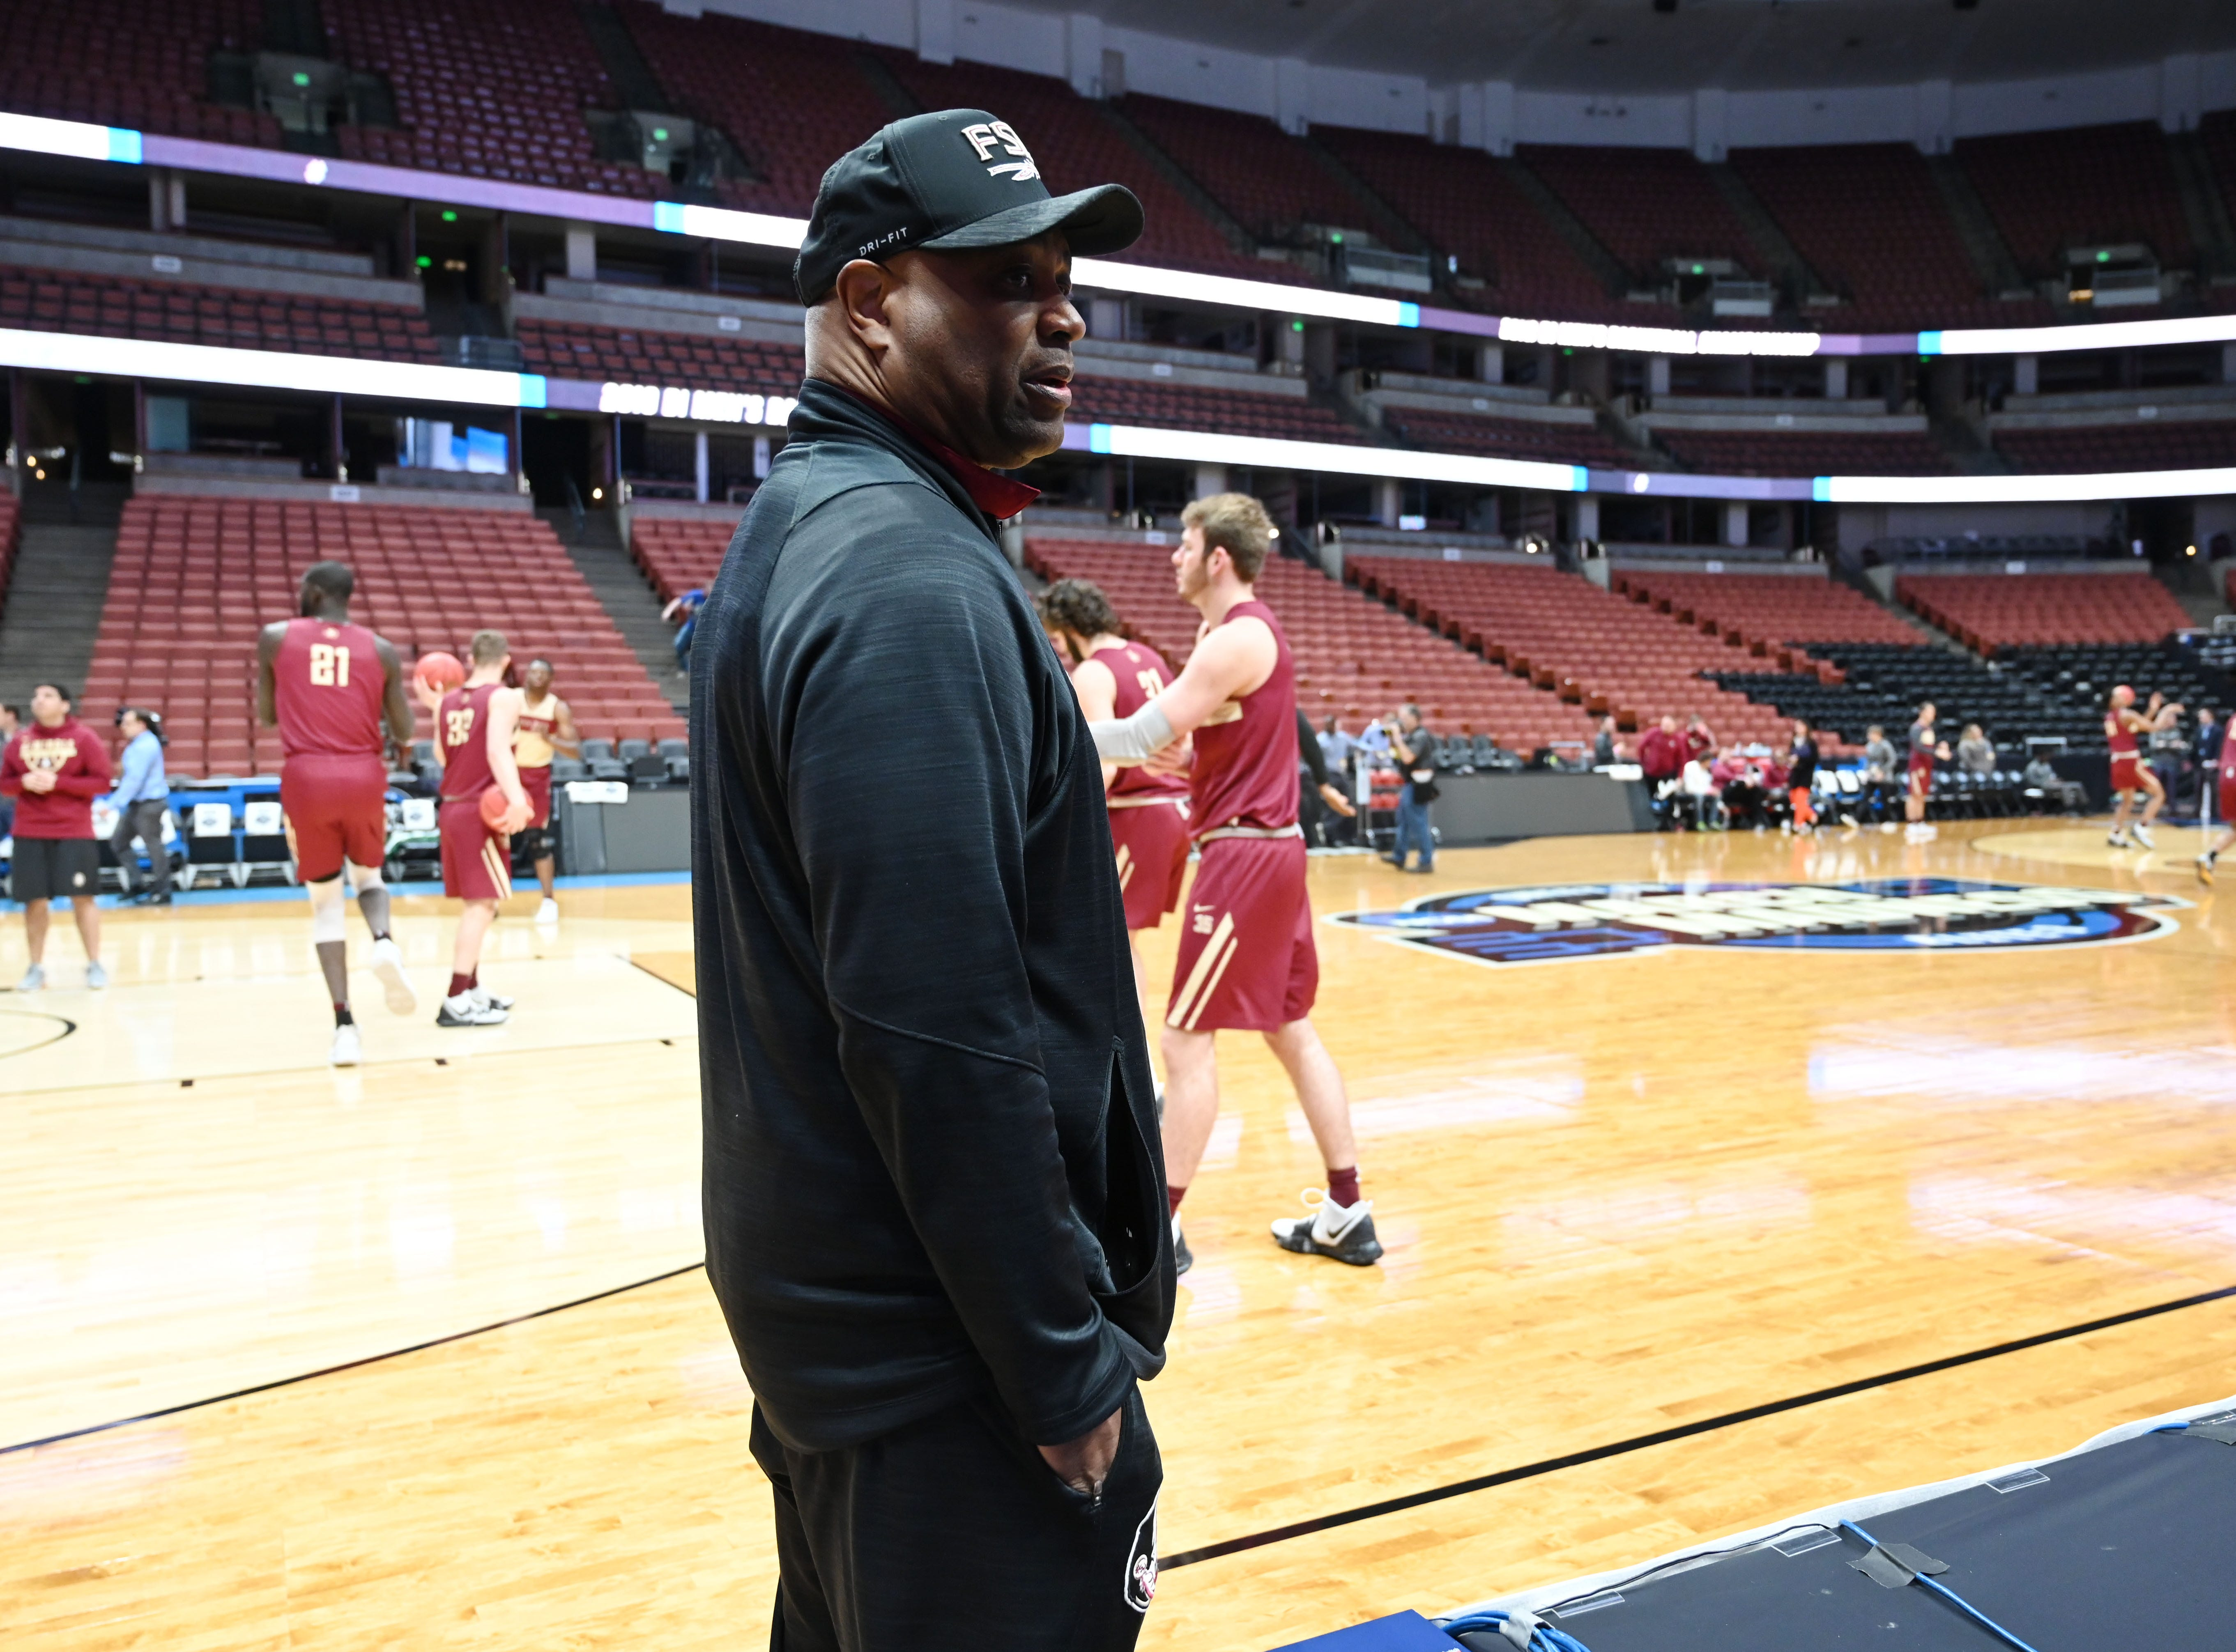 March 27, 2019; Anaheim, CA, USA; Florida State Seminoles head coach Leonard Hamilton during practice for the west regional of the 2019 NCAA Tournament at Honda Center. Mandatory Credit: Robert Hanashiro-USA TODAY Sports